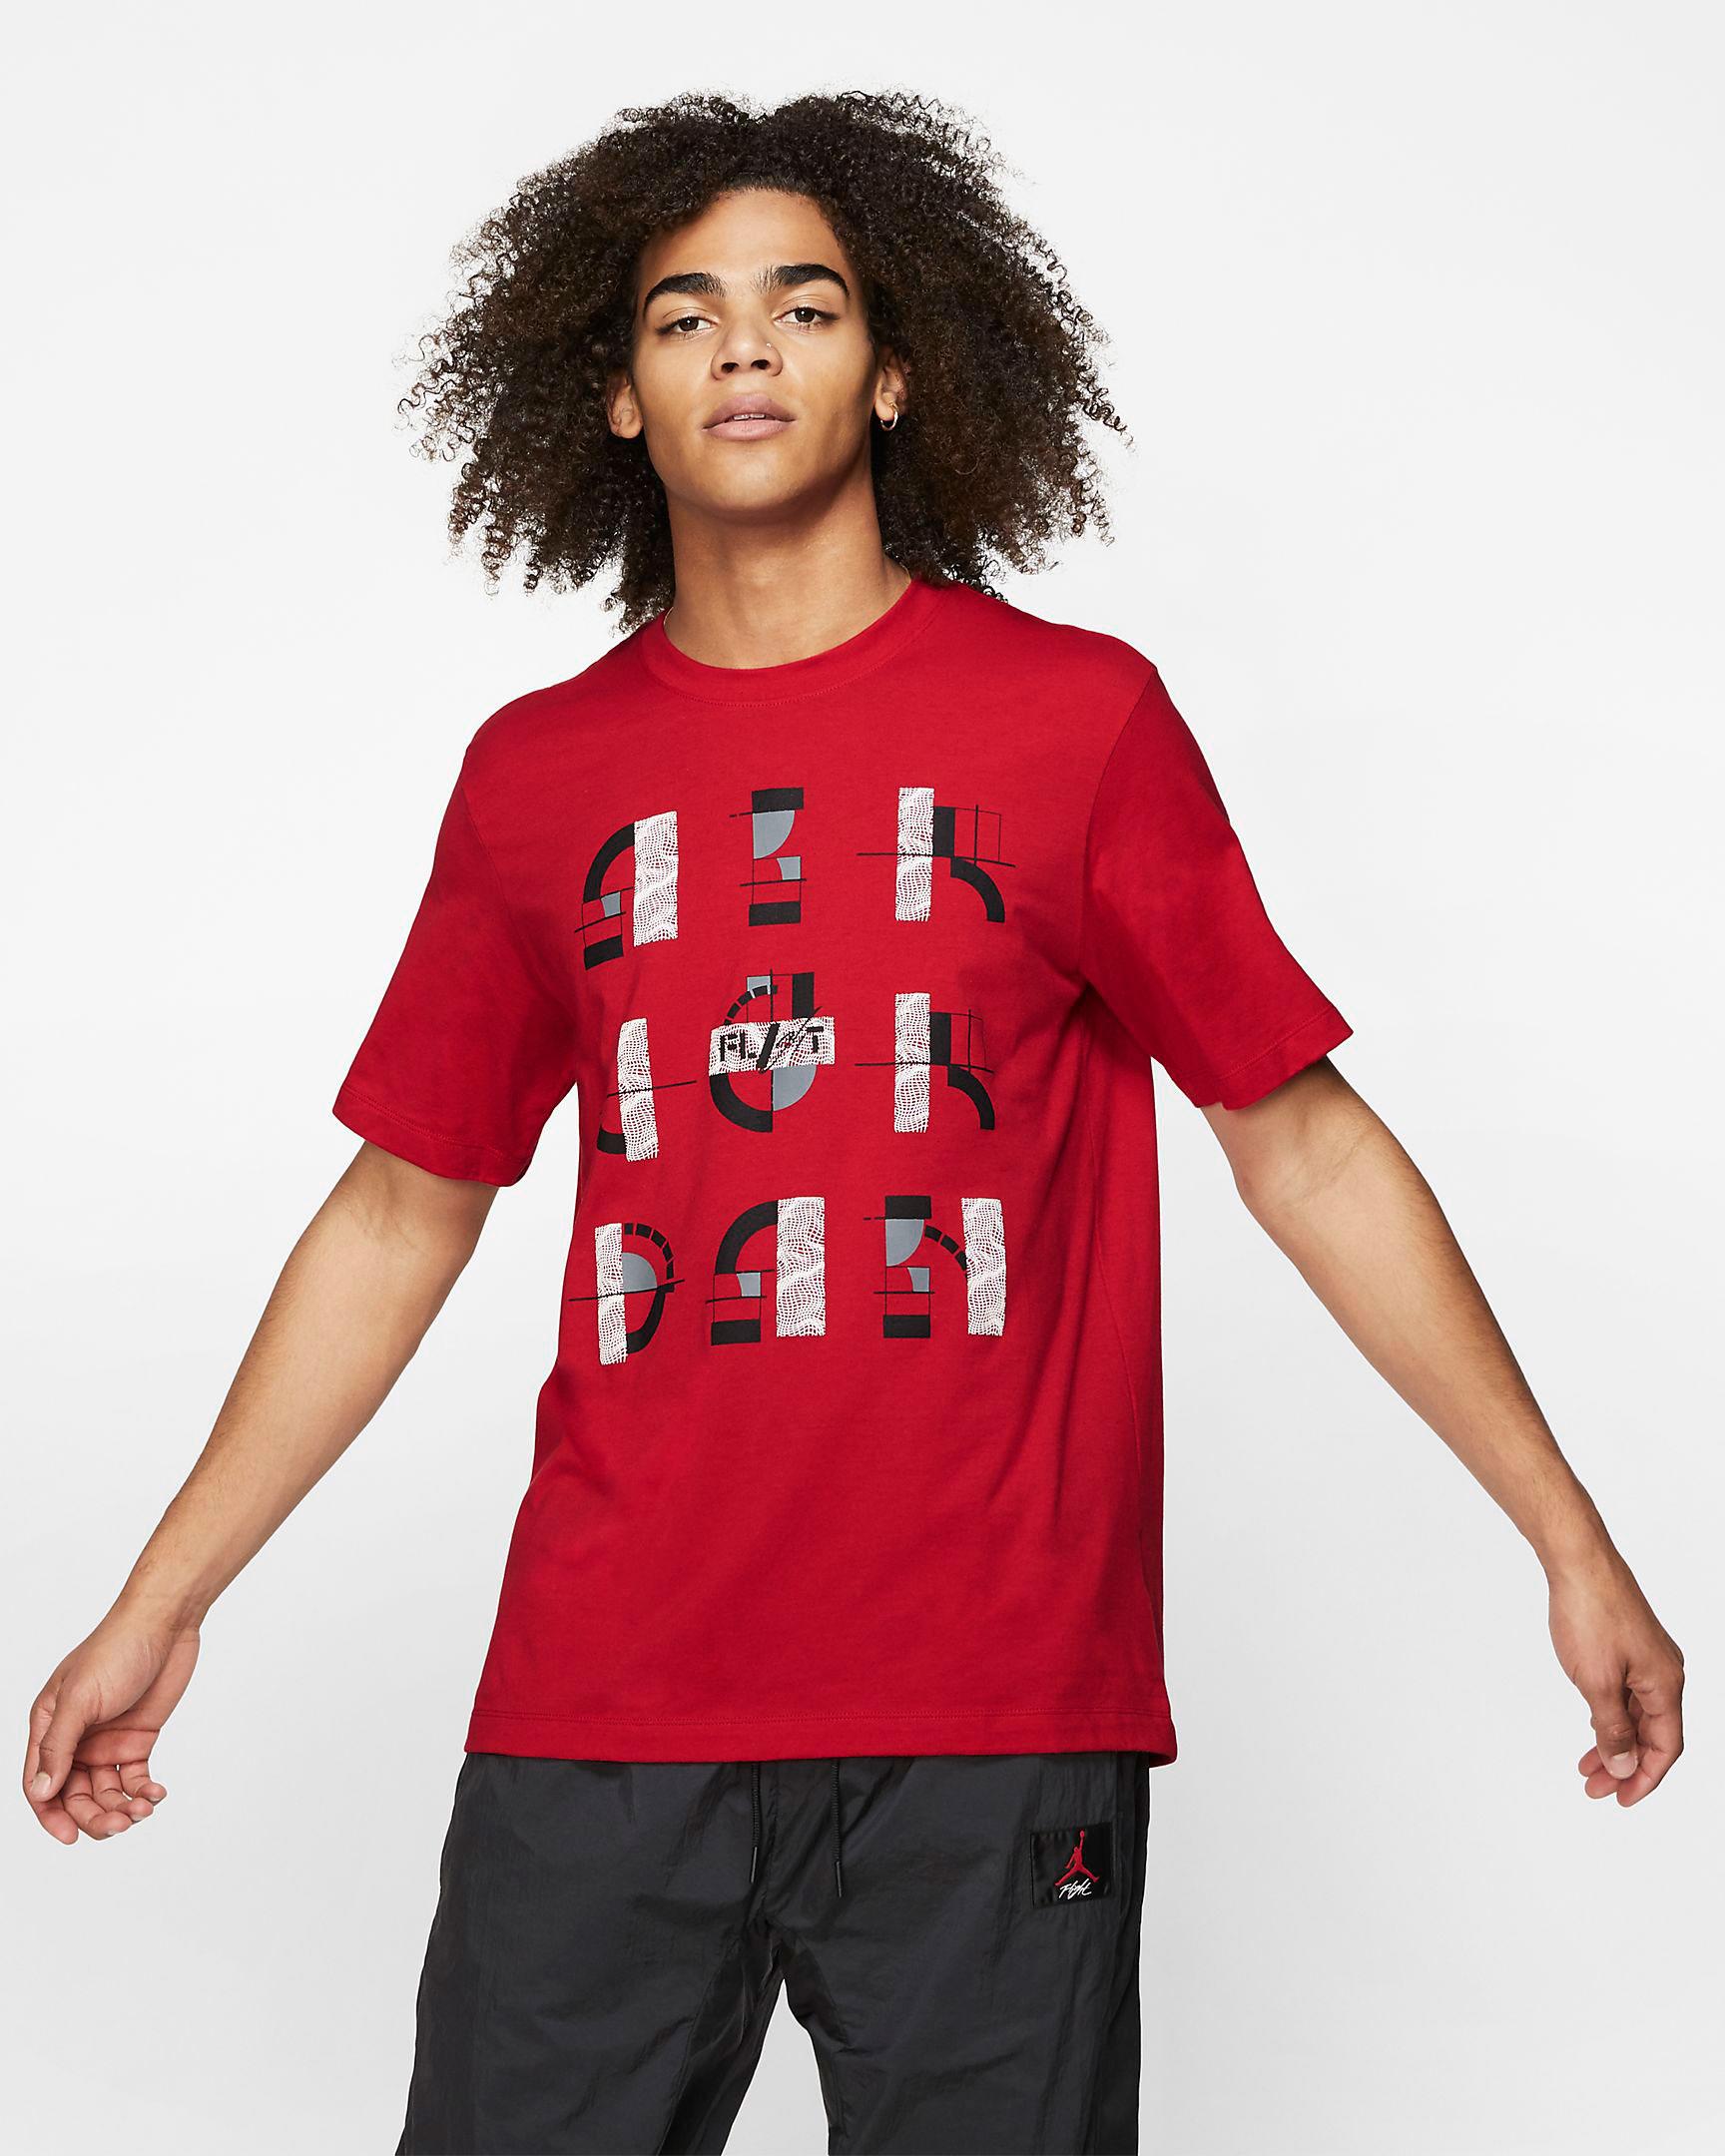 air-jordan-4-bred-2019-sneaker-tee-shirt-3